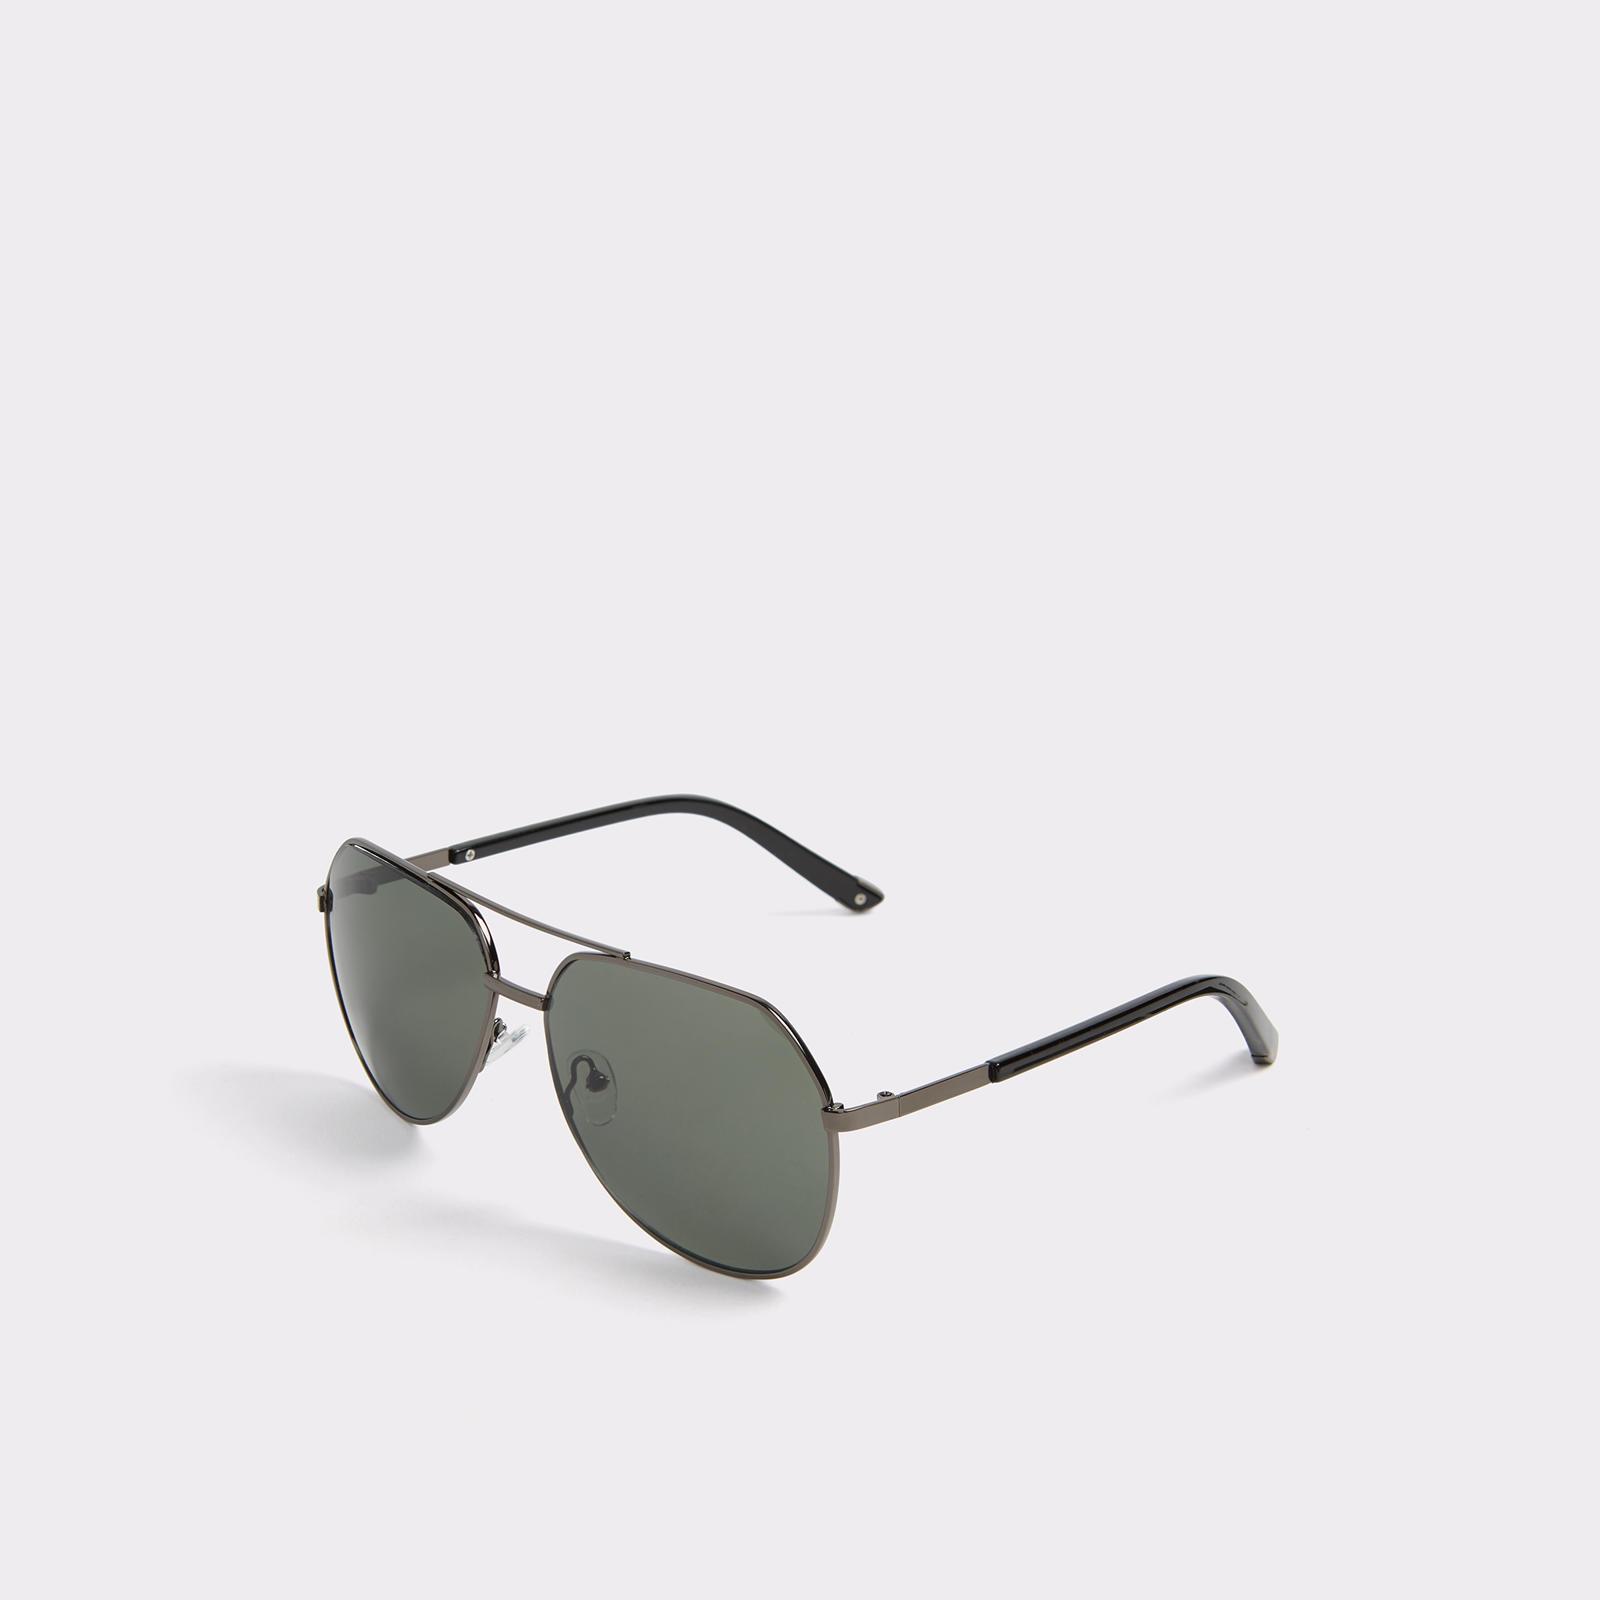 Ochelari soare gri, pentru barbati, ALDO - Laure12, din PVC